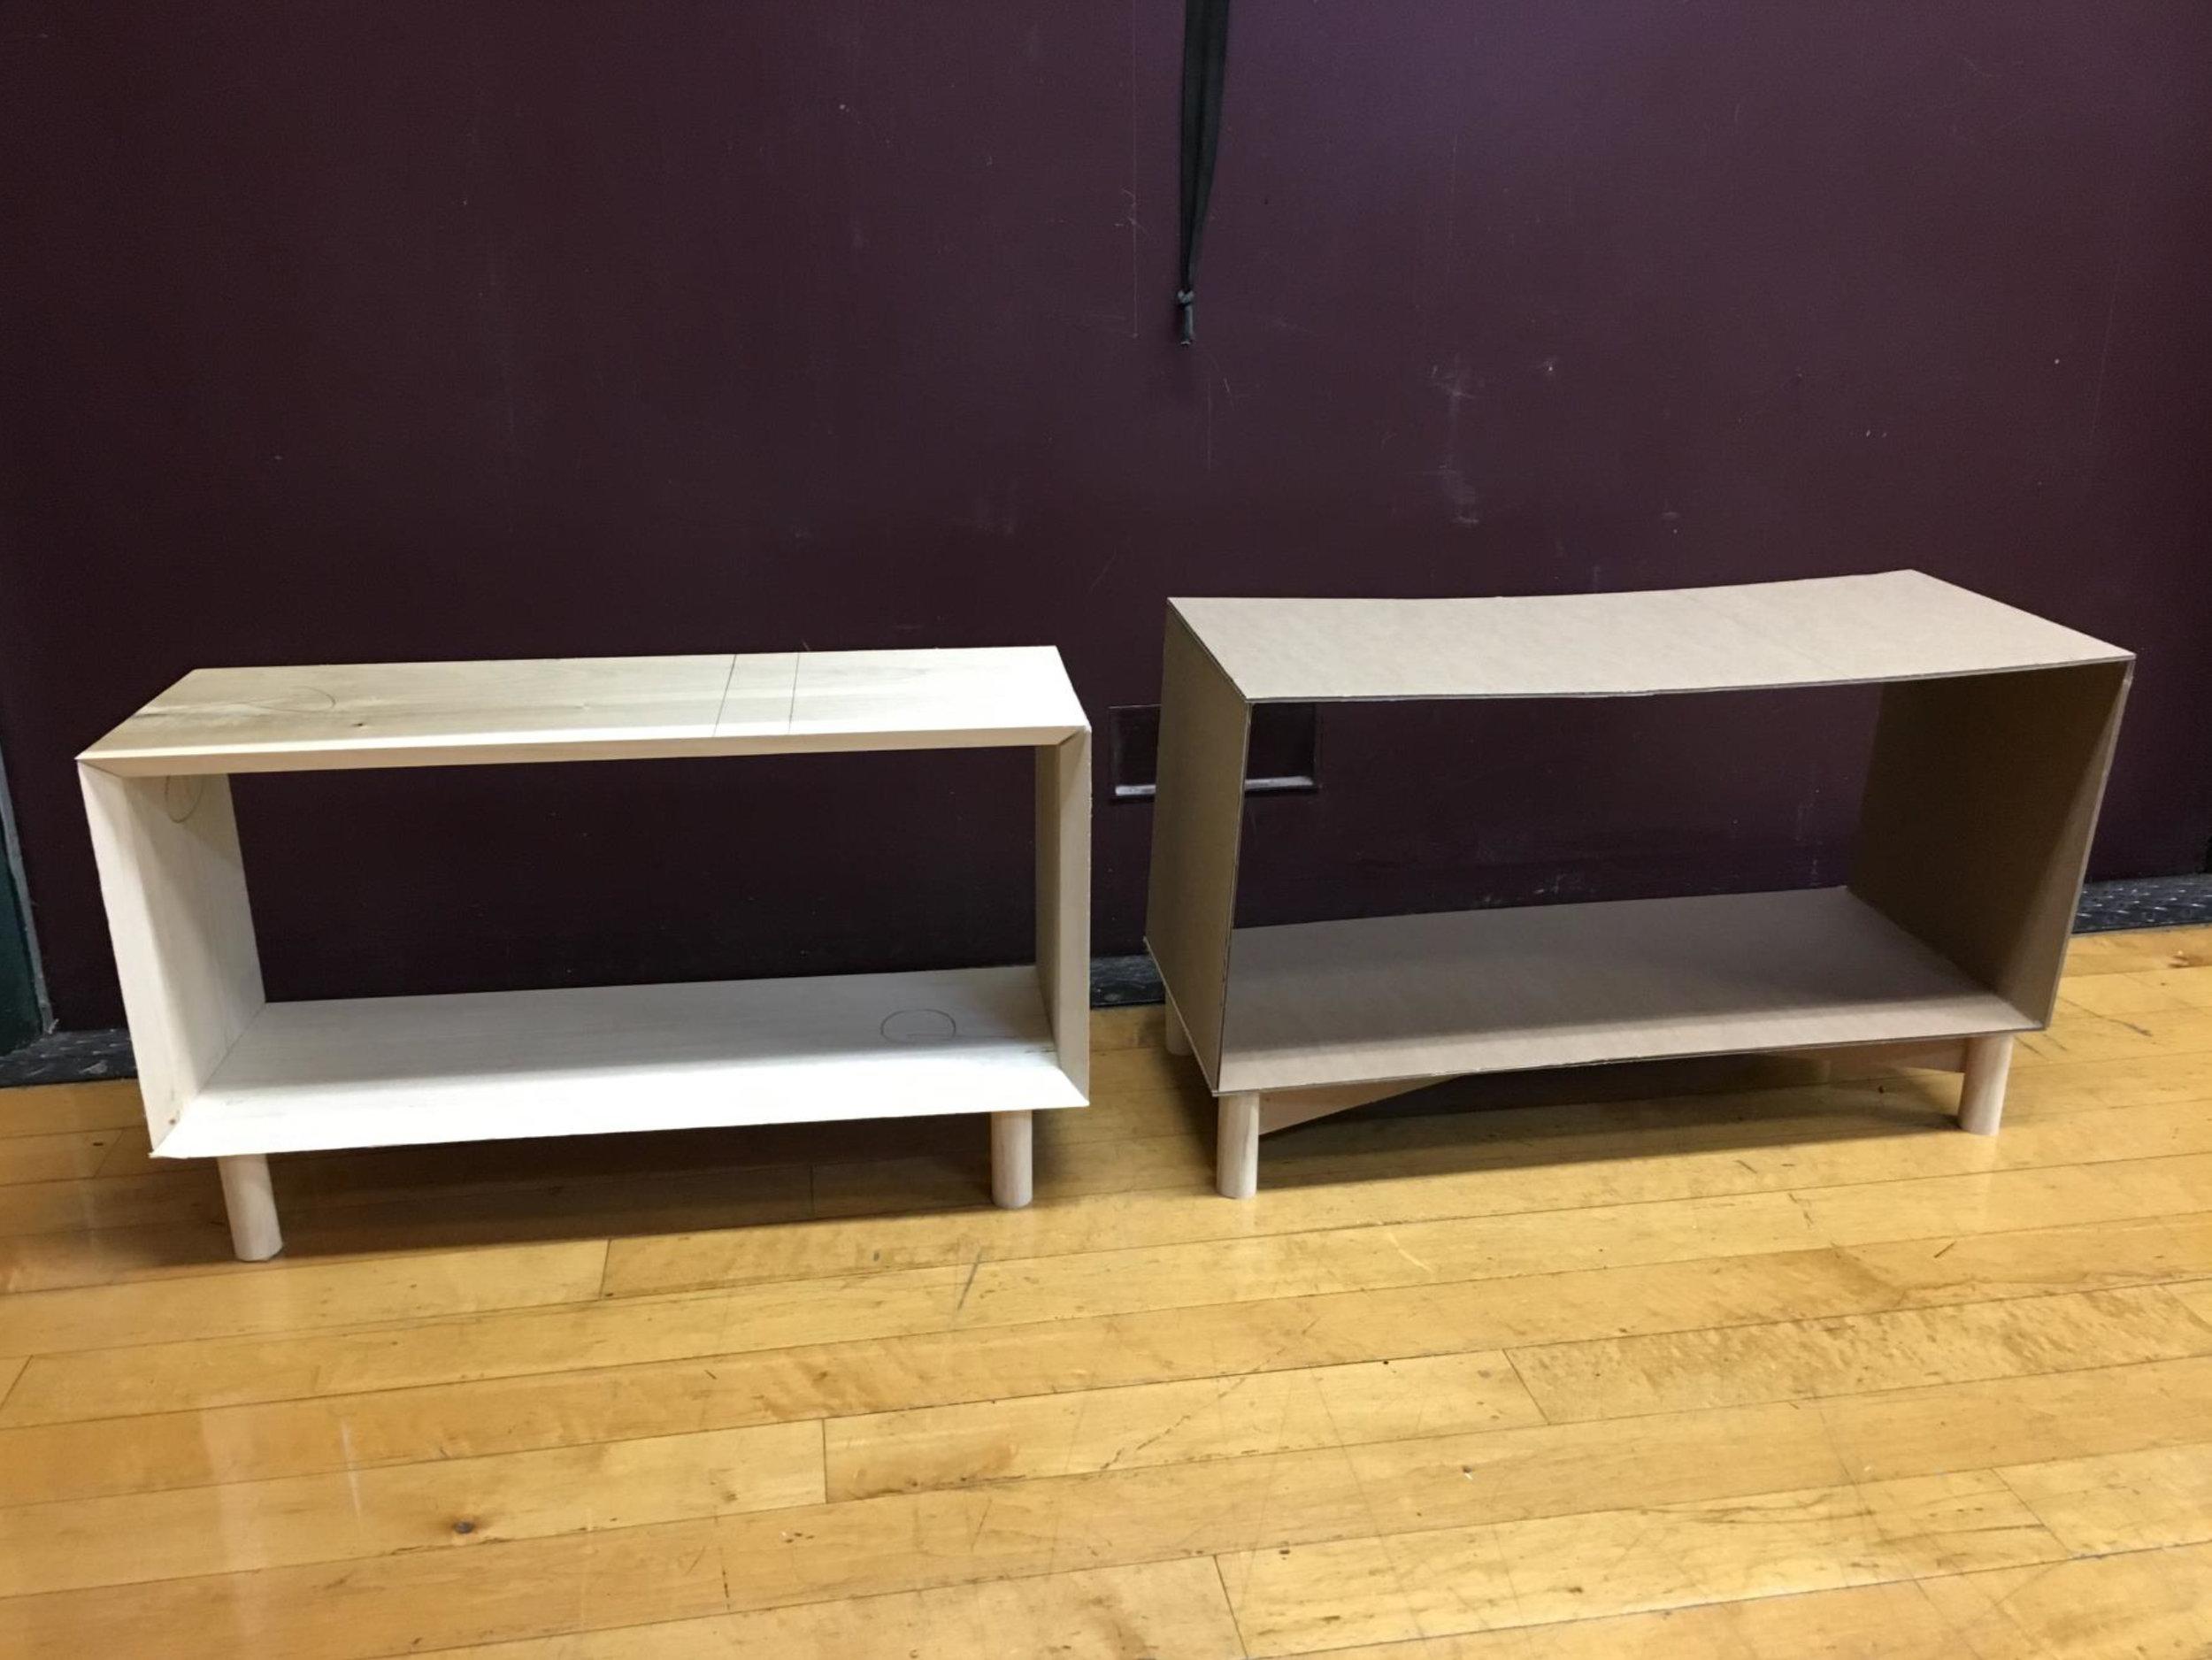 Full-Scale Furniture Models (2016)